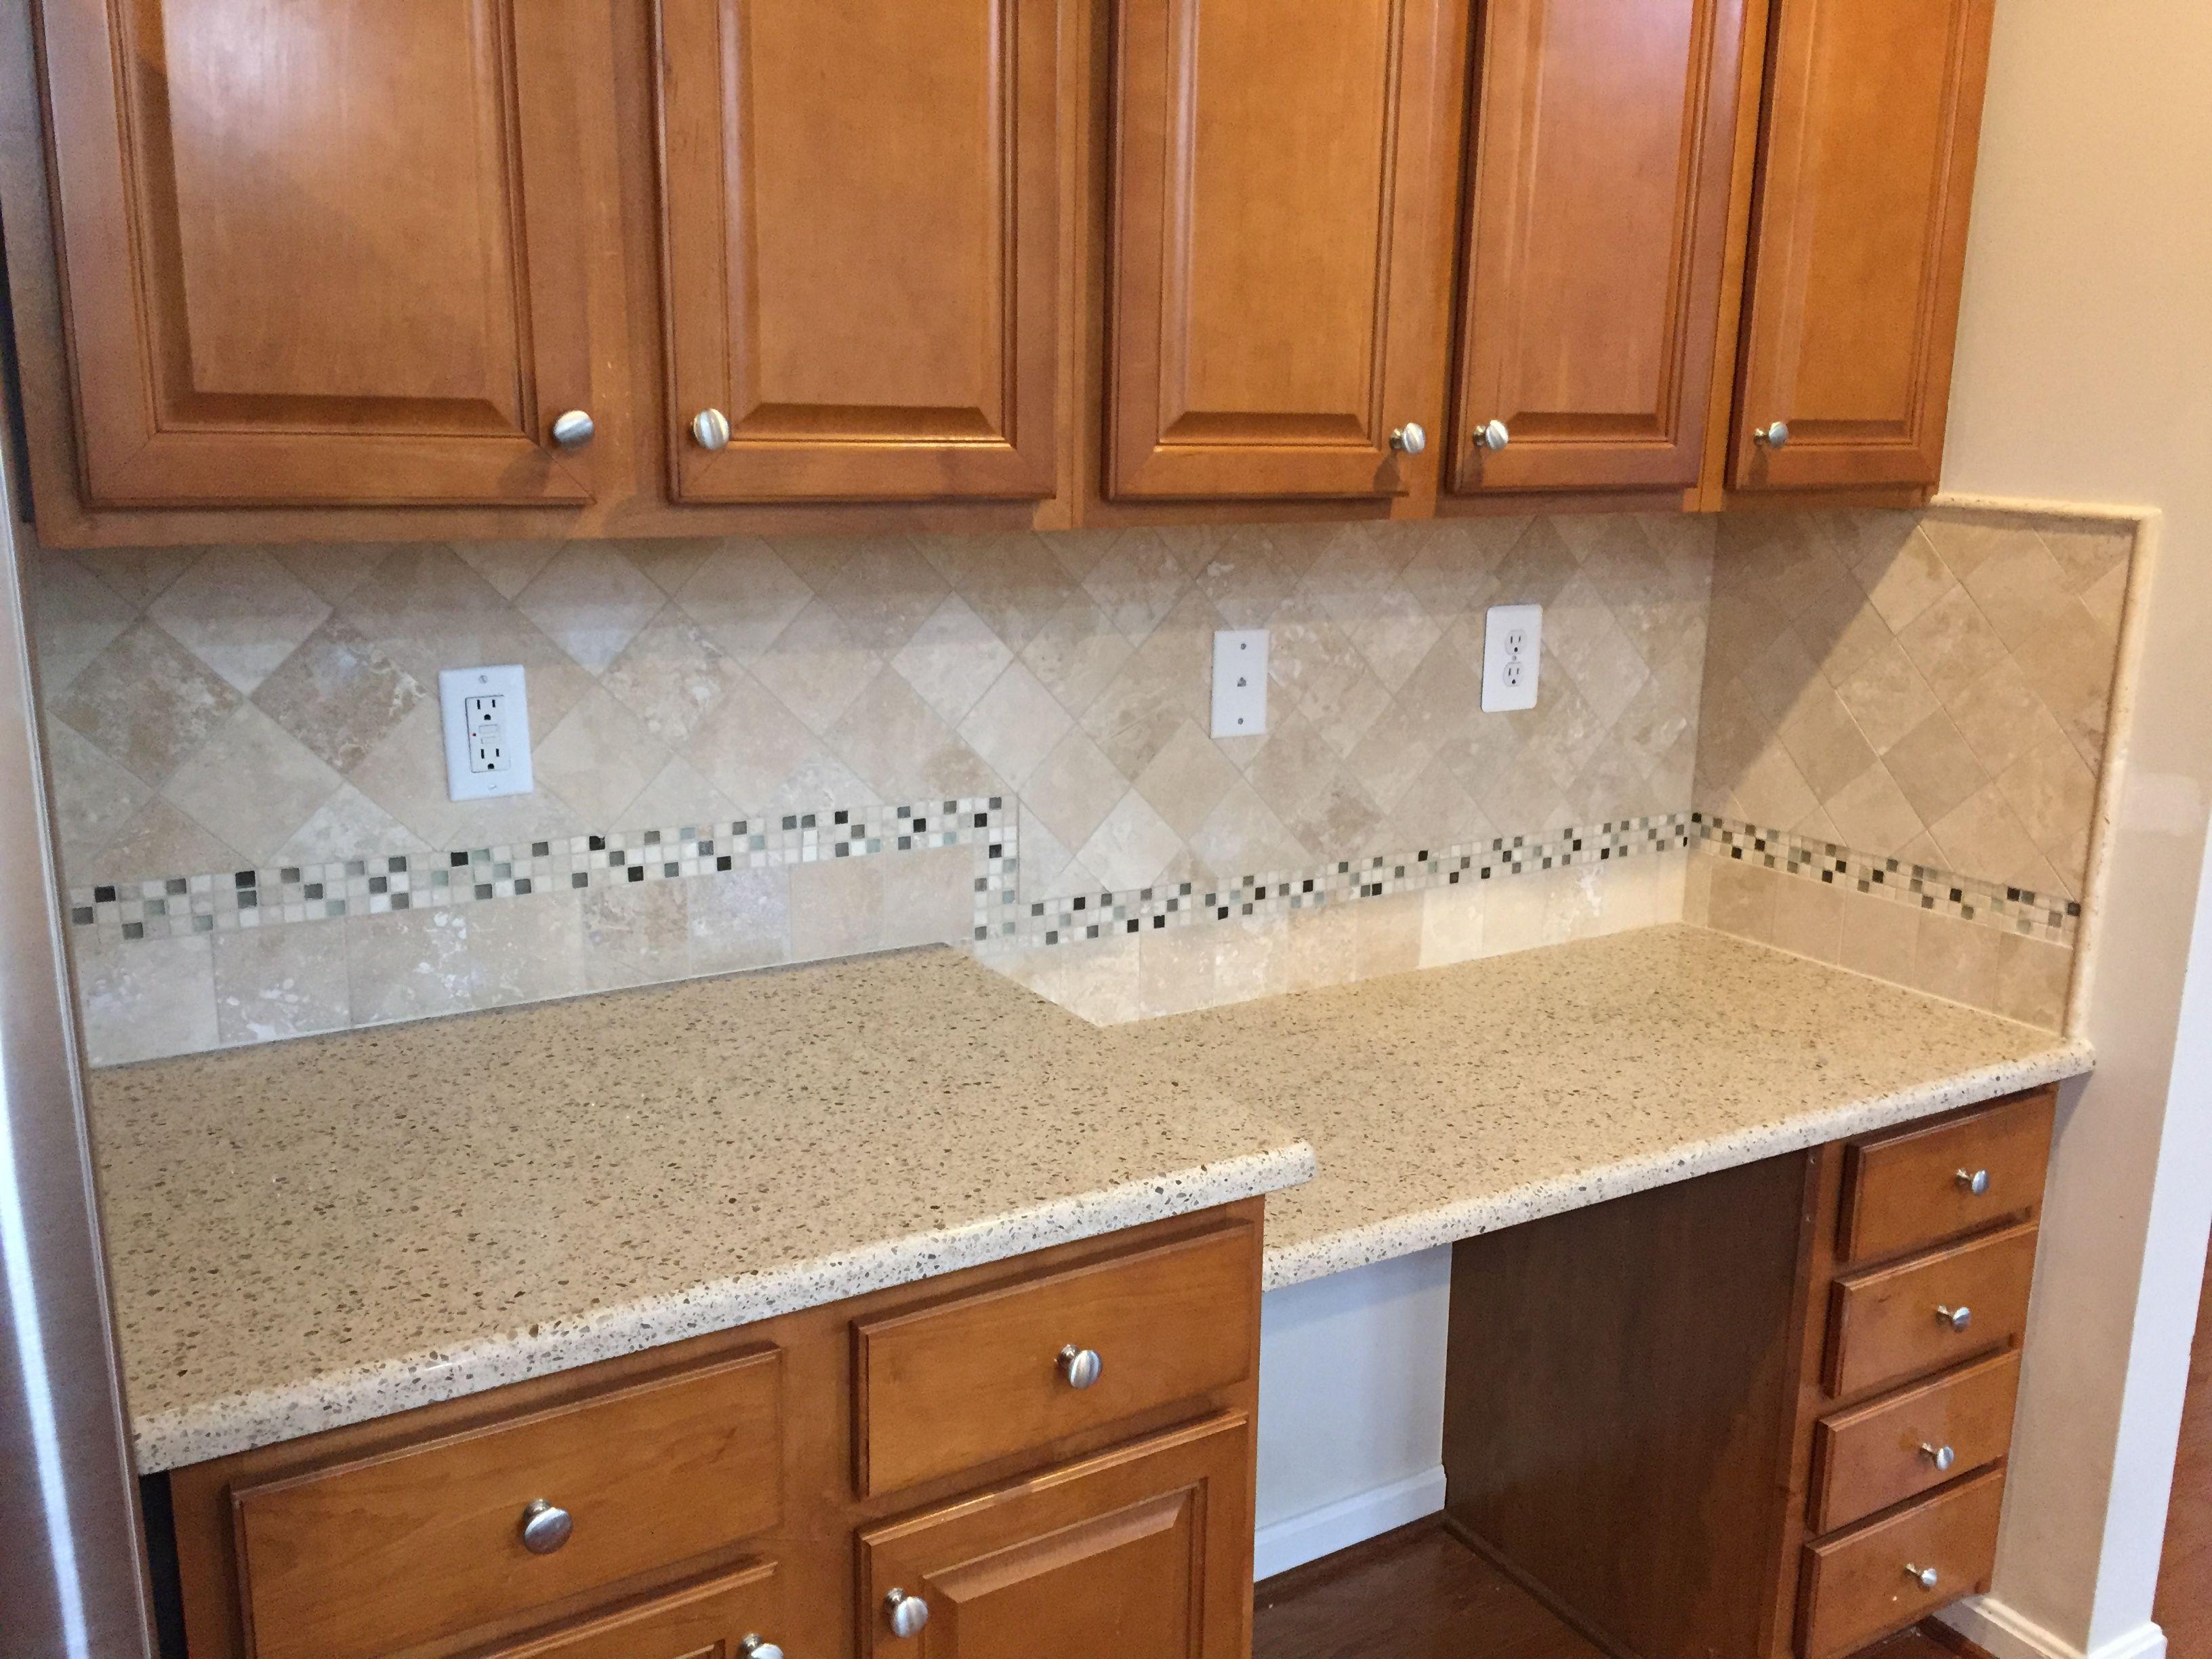 Bamboo Silestone And Travertine Backsplash Countertops Kitchen Ideas